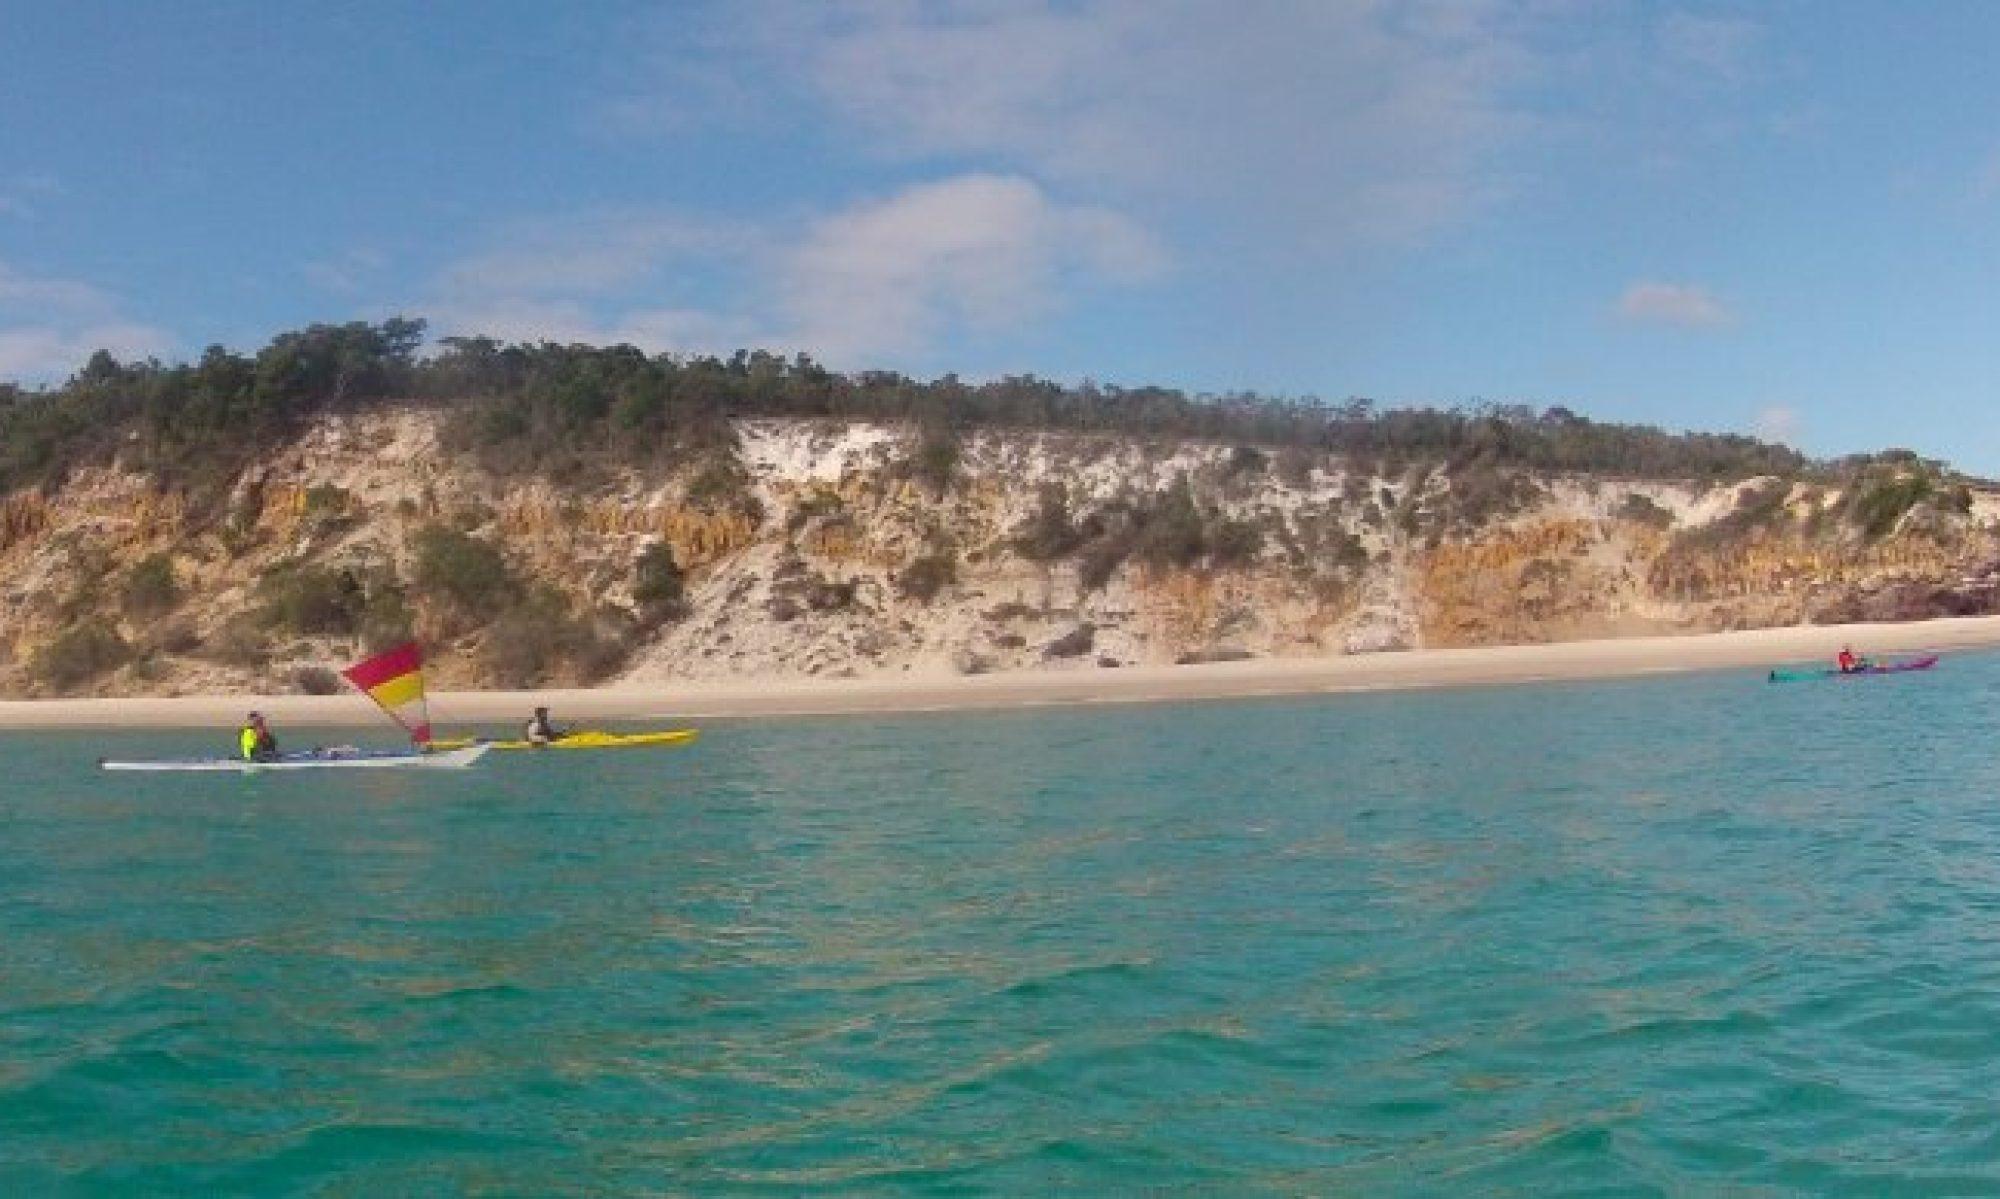 University of Queensland Canoe Club